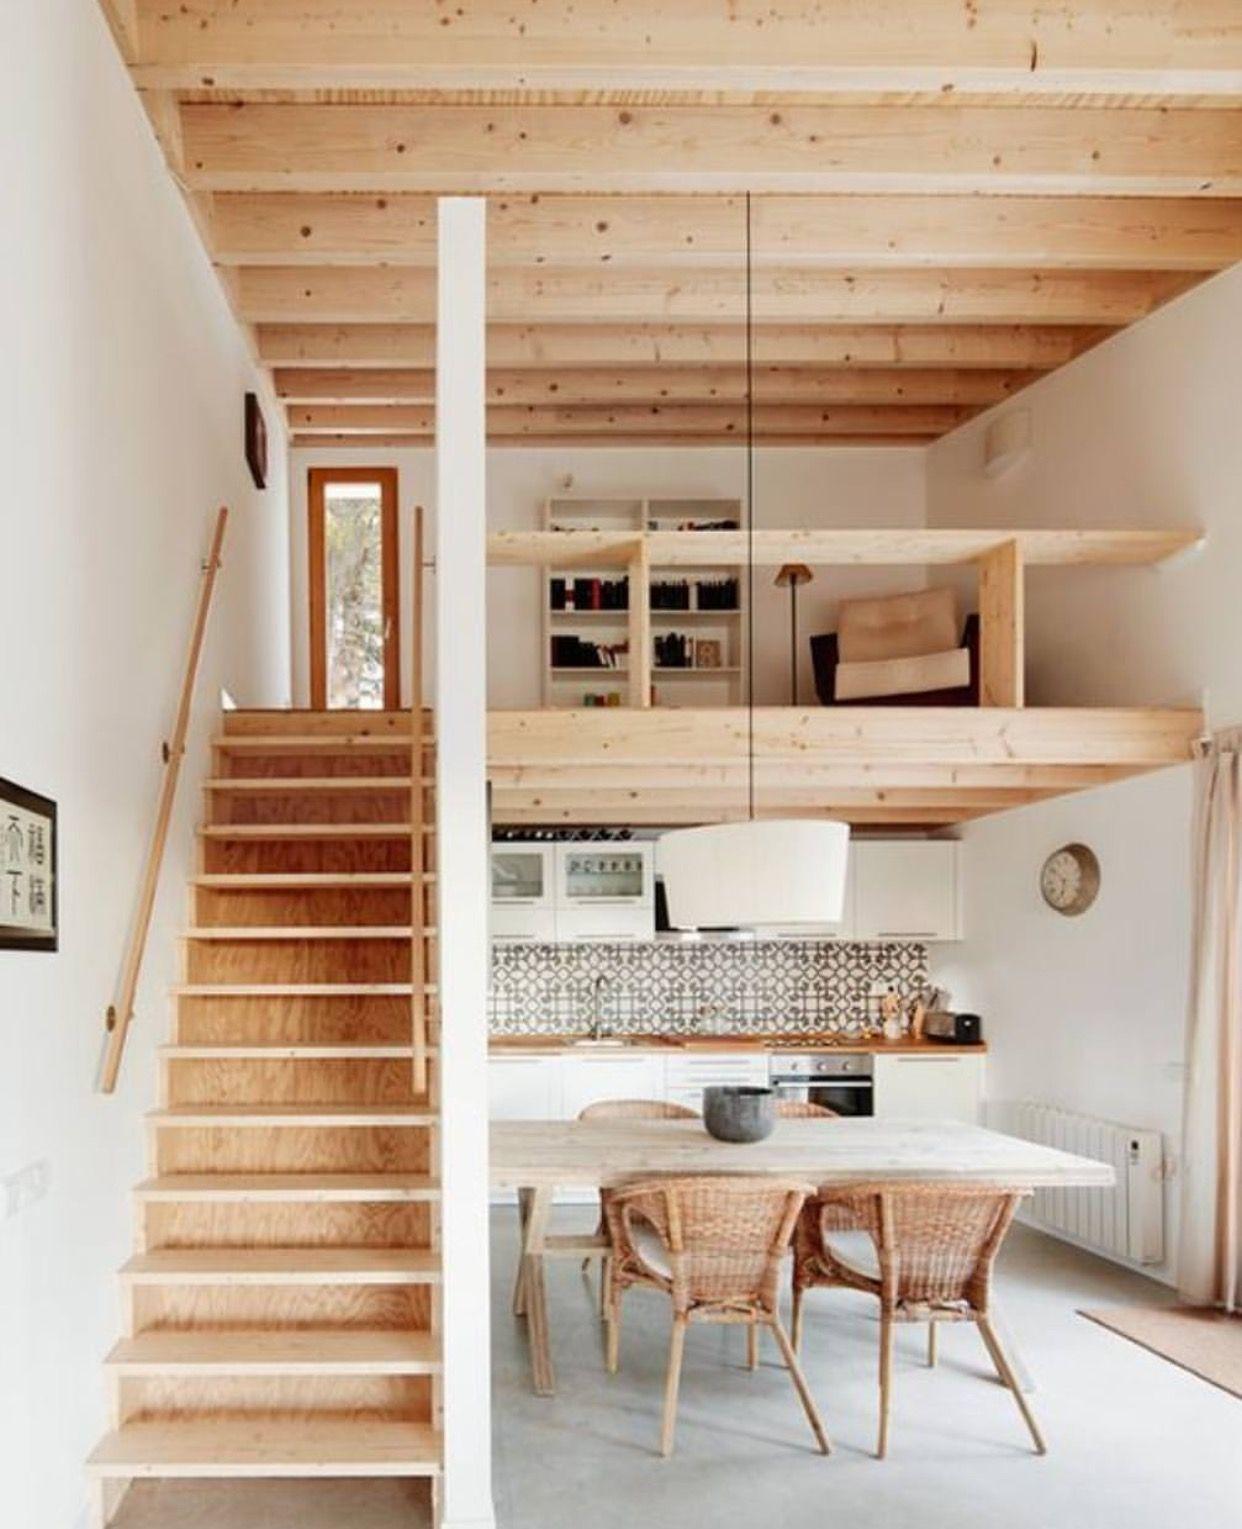 Unique Tiny Home Interior Pictures   Best Home Decorating ...